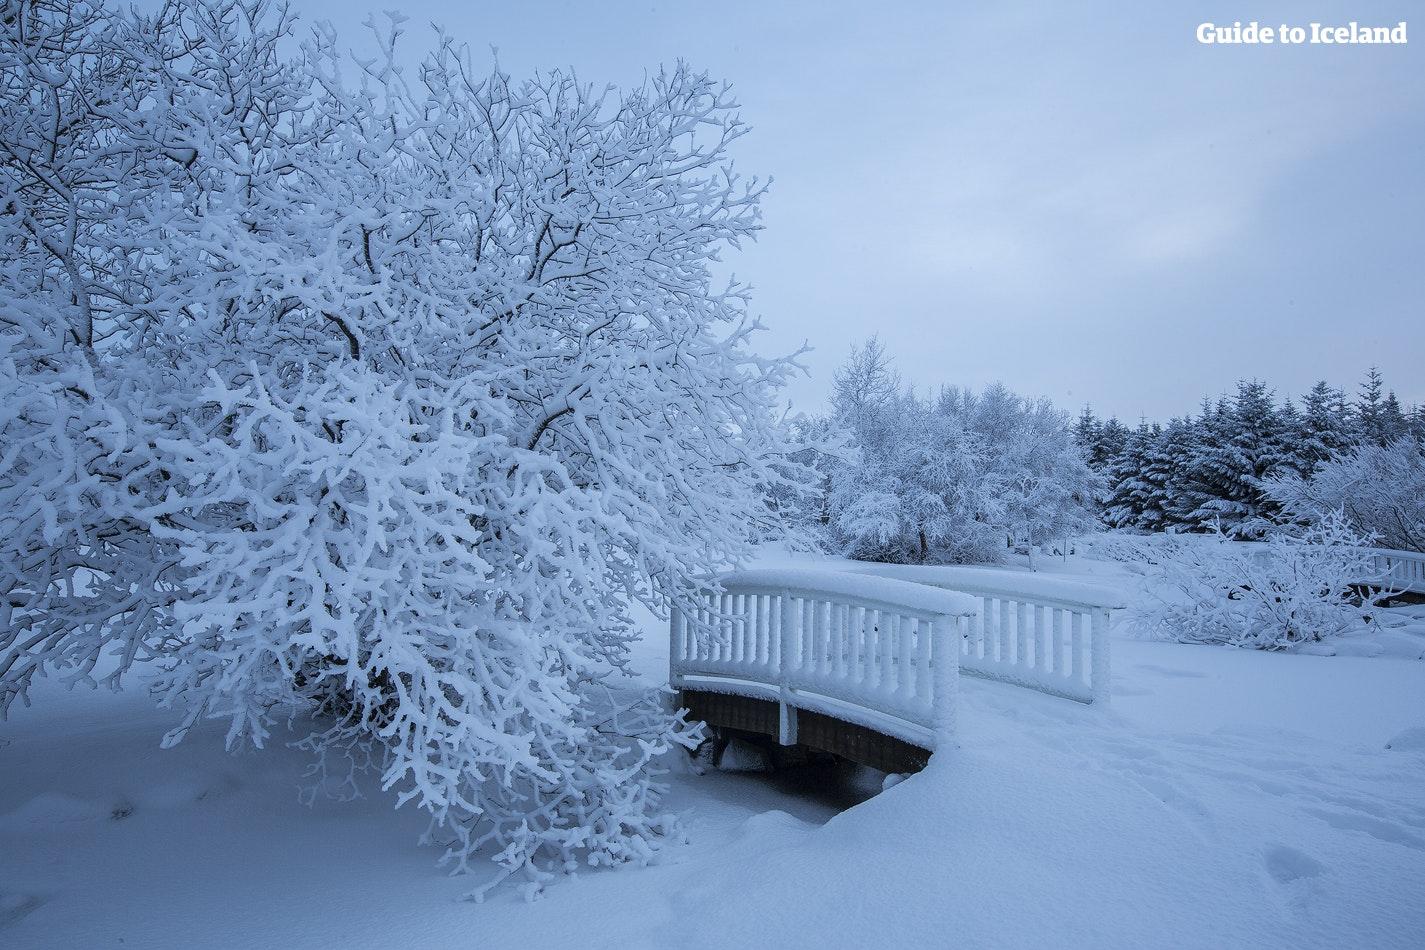 Reykjavík's botanical garden during winter is perfect for proposals